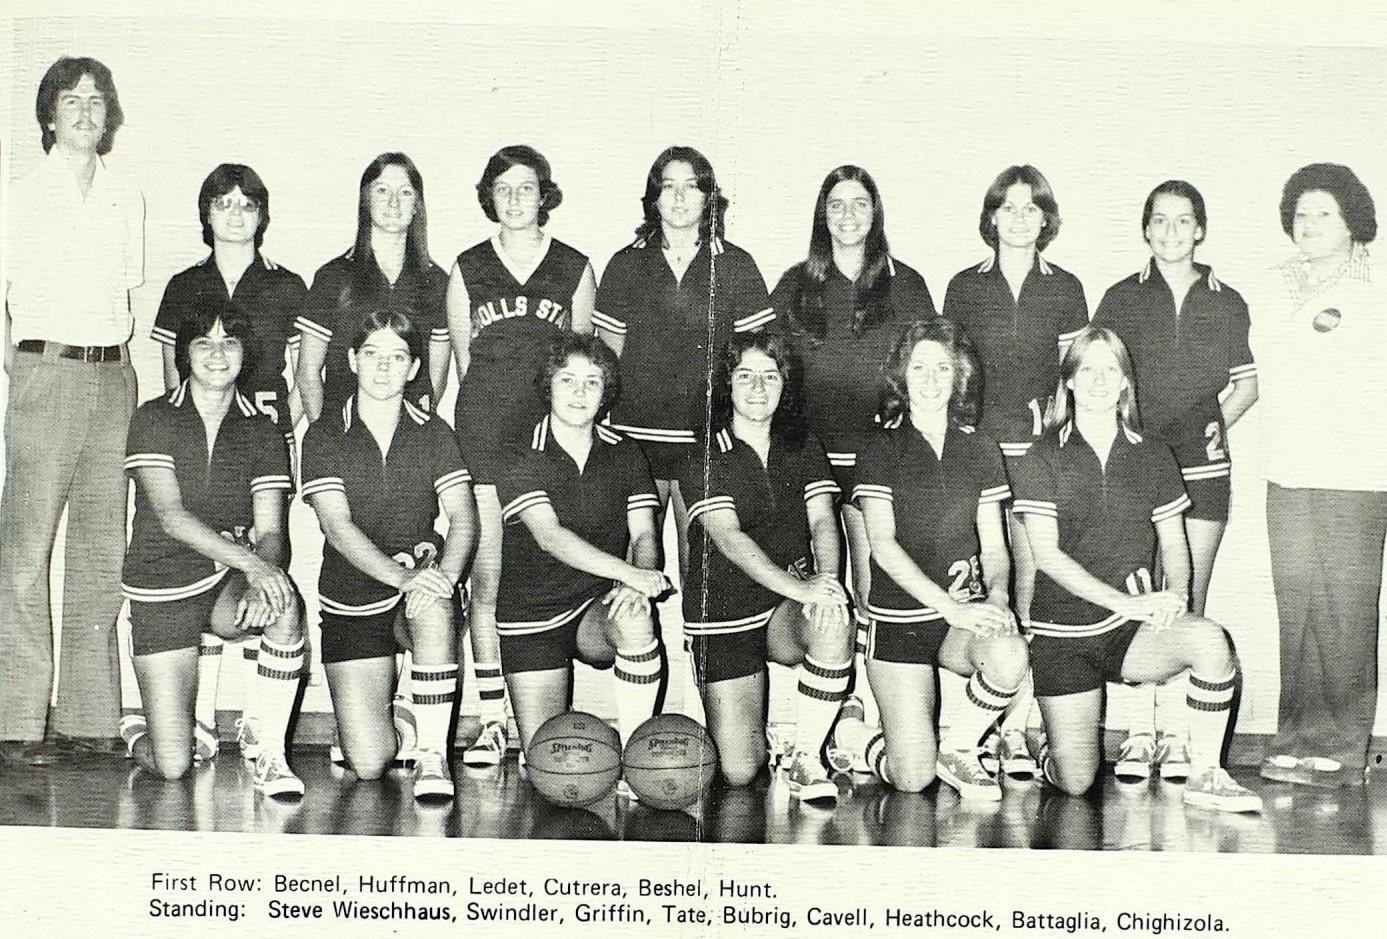 1975-1976 Team Photo